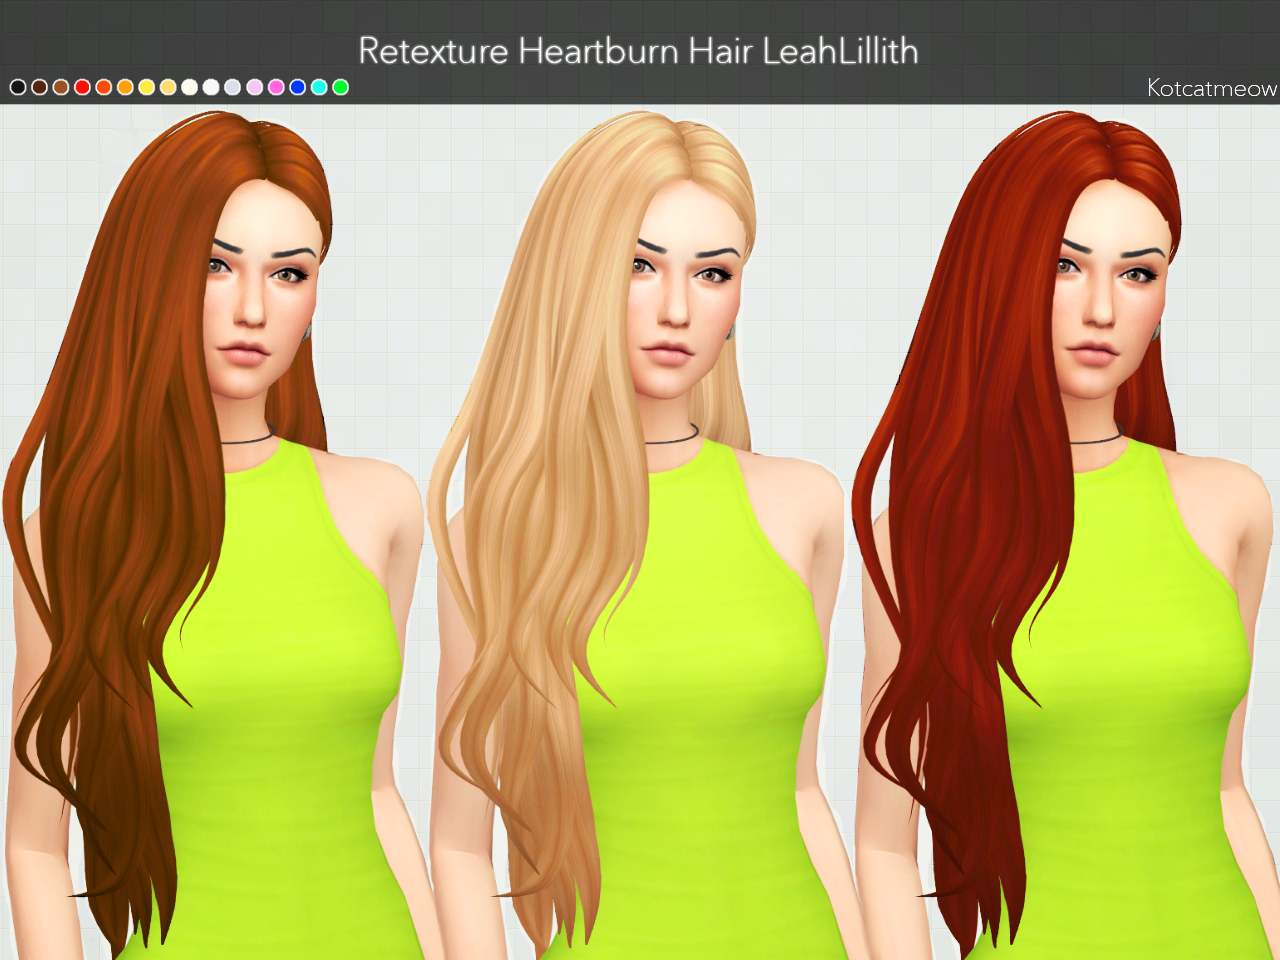 Прическа - LeahLillith Heartburn Hair Clayified